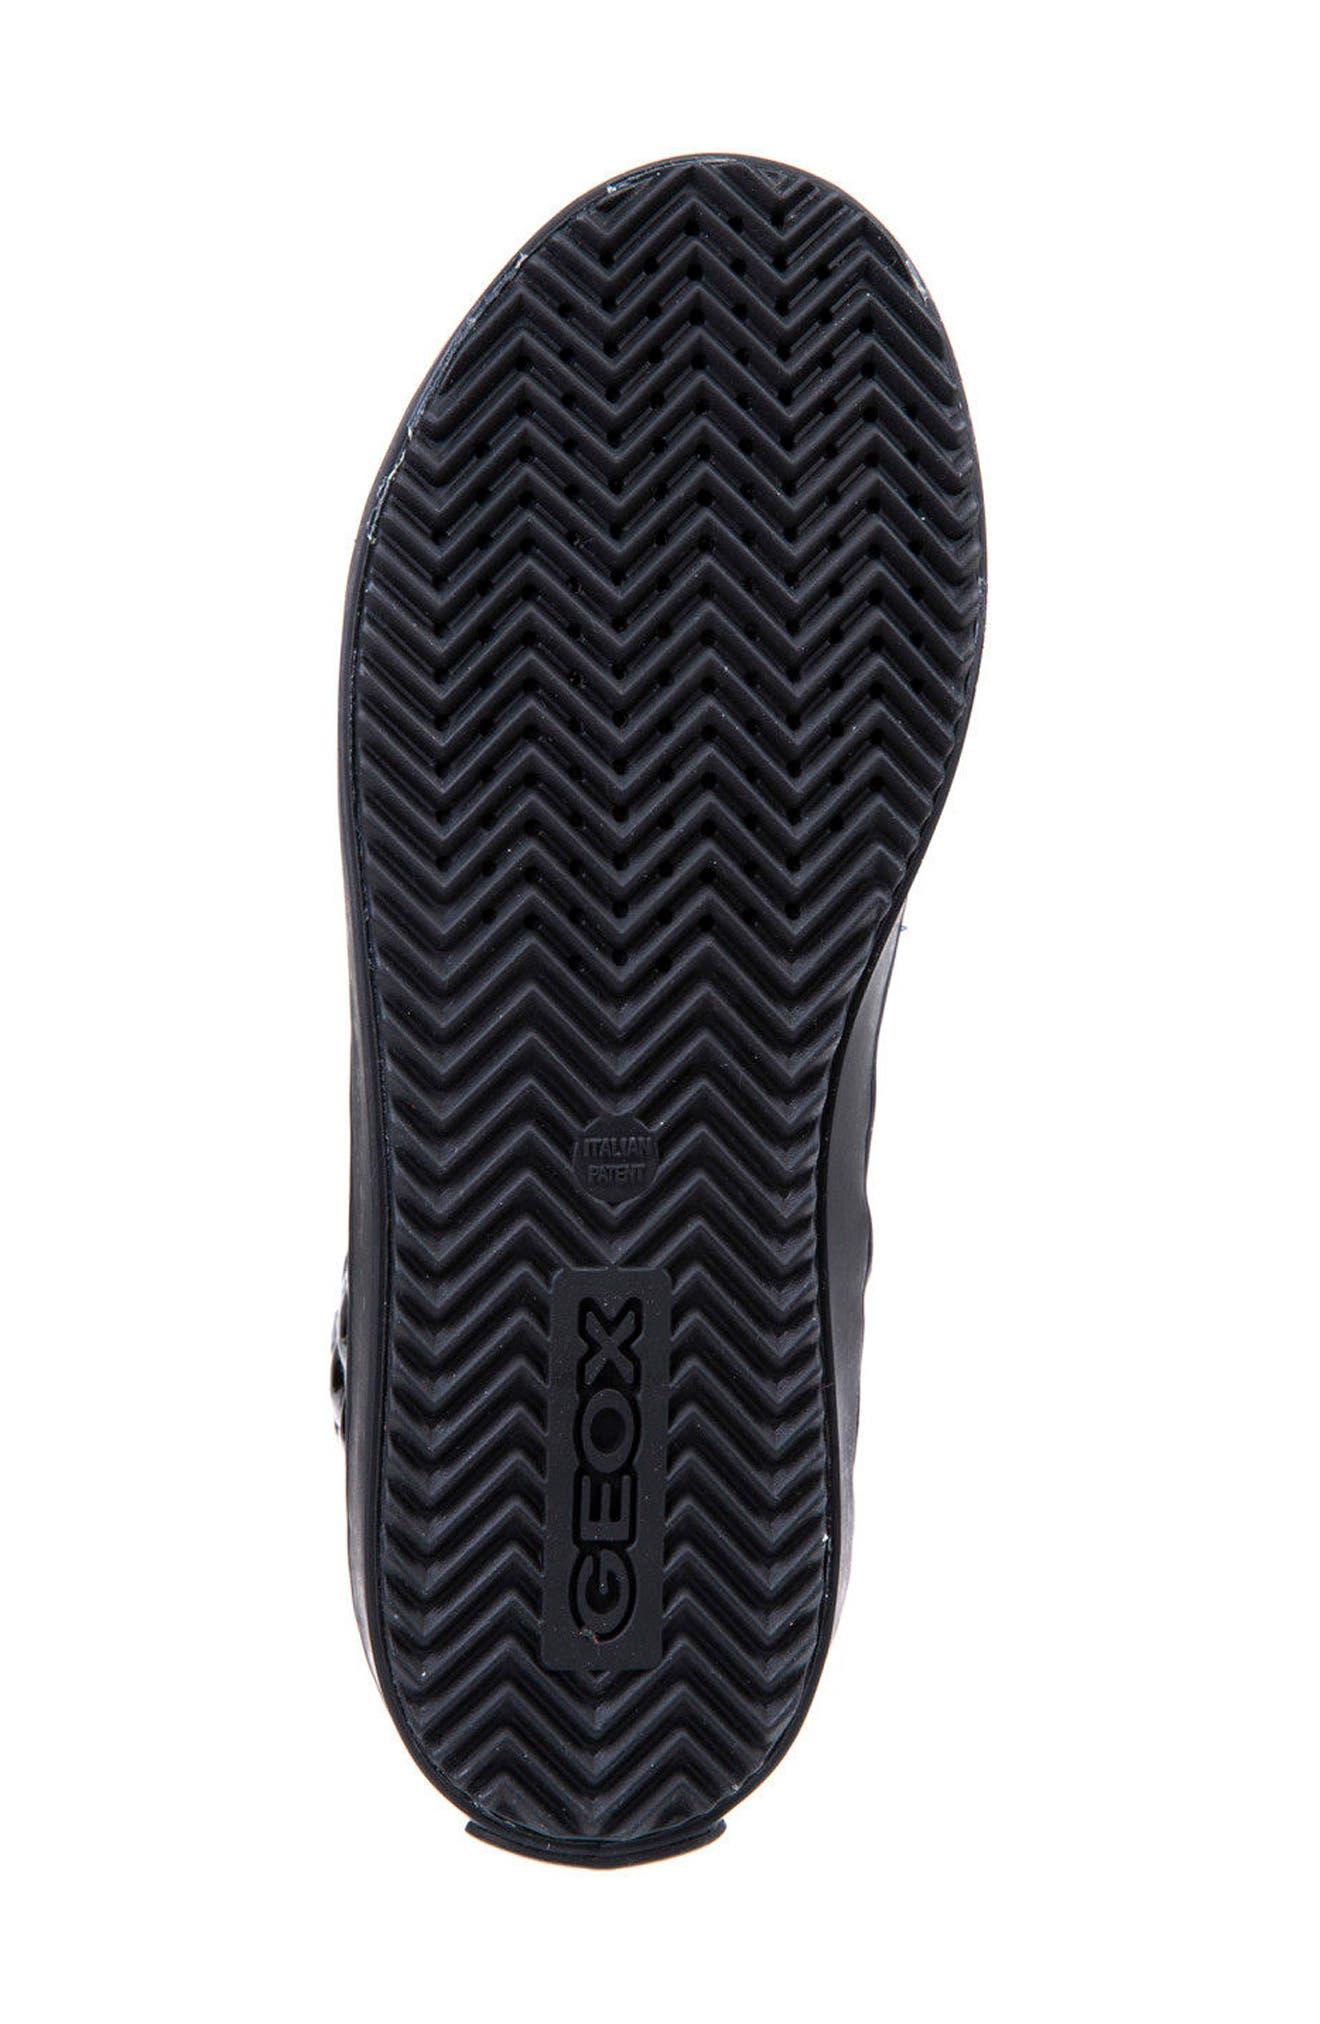 Kalispera Girl Quilted High-Top Sneaker,                             Alternate thumbnail 6, color,                             BLACK